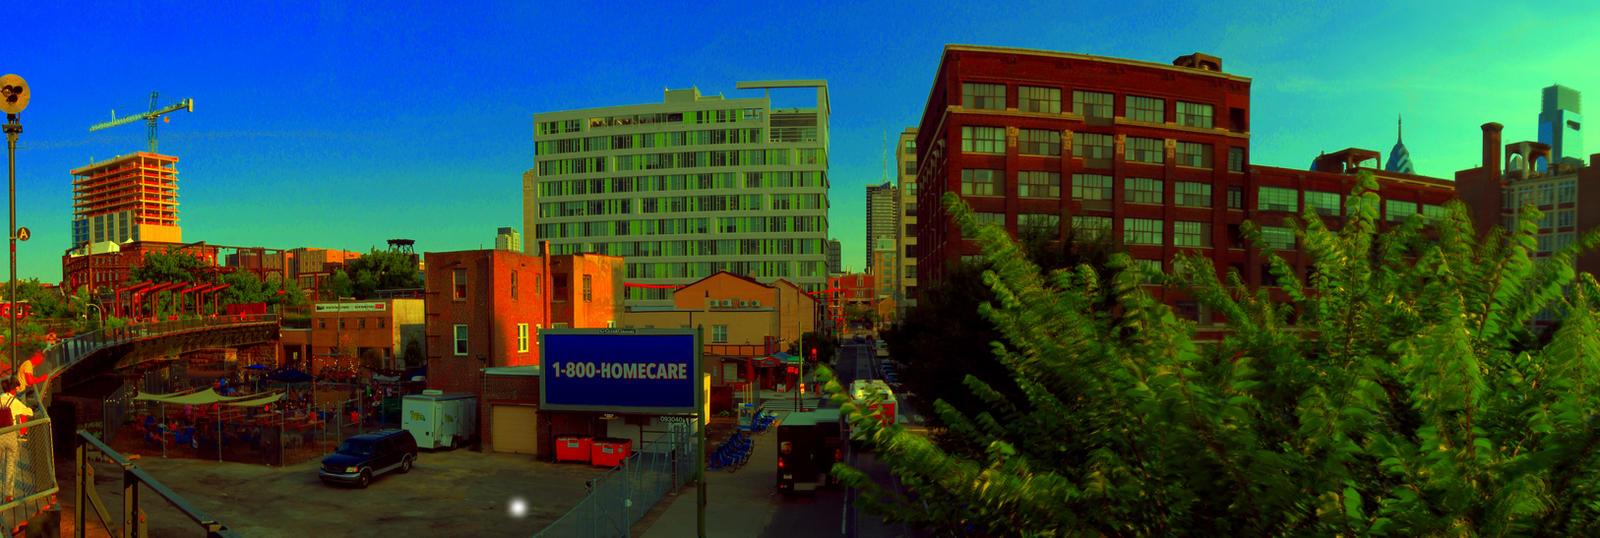 Panorama 3676 hdr pregamma 1 reinhard05 brightness